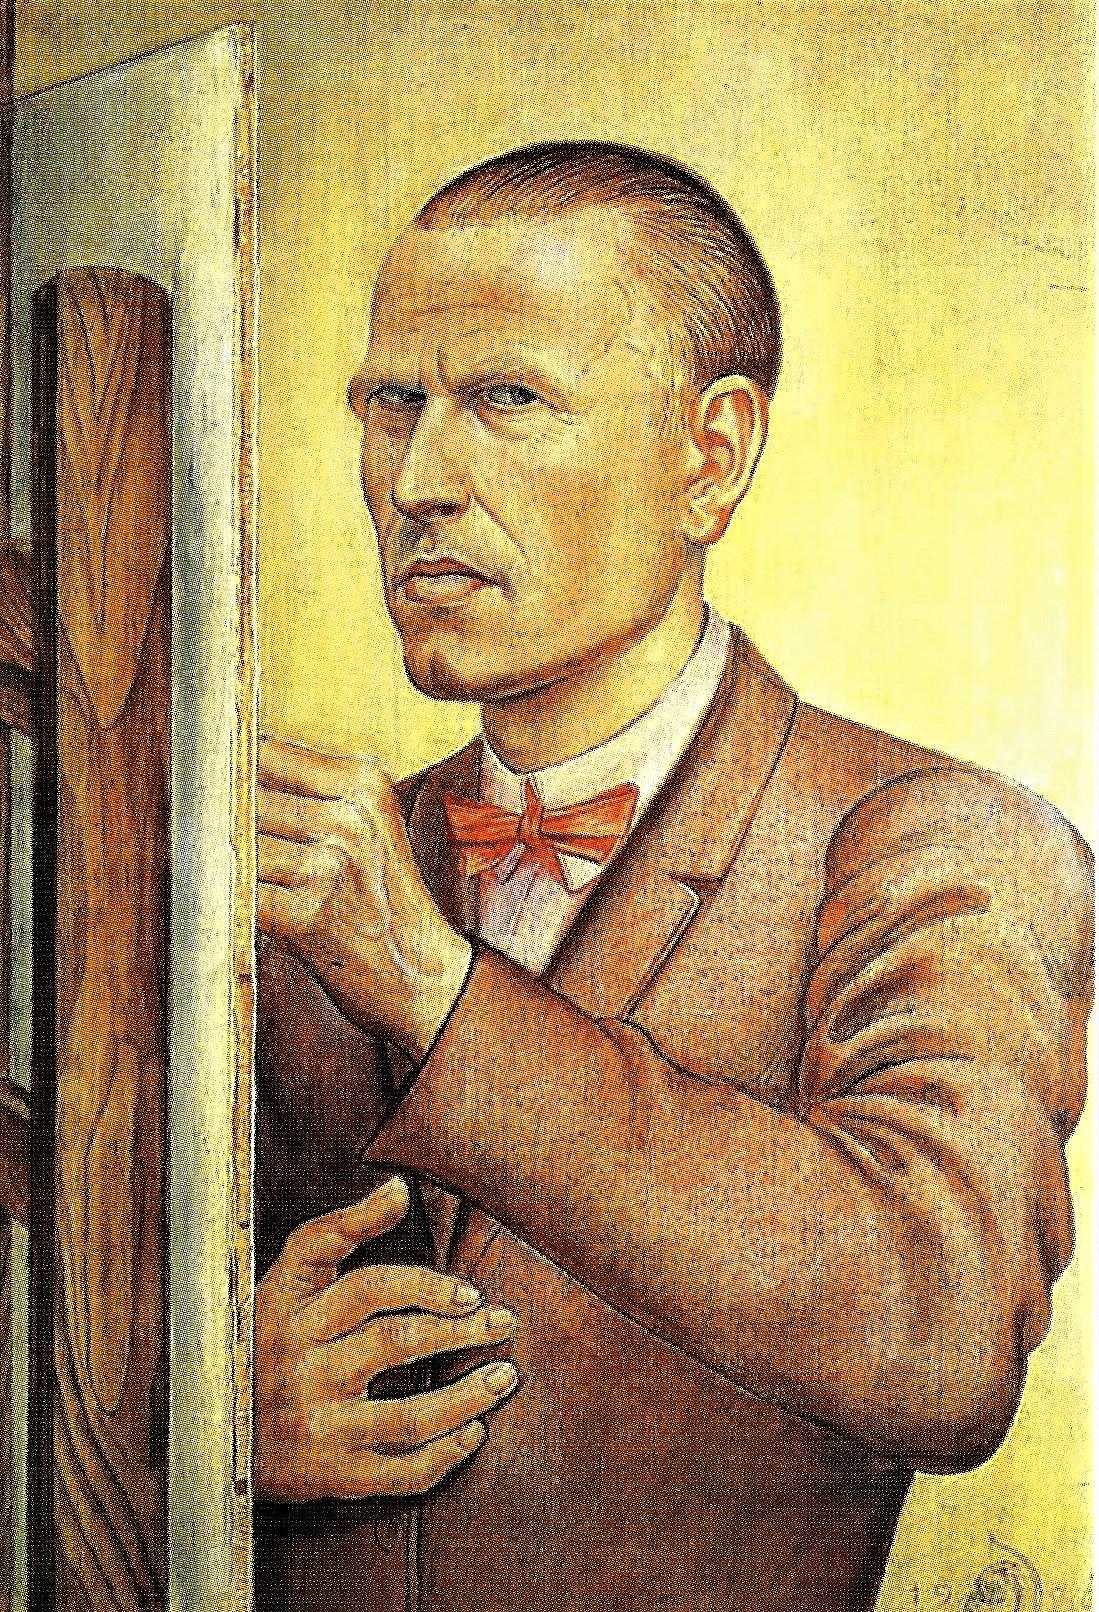 Otto Dix: Selbstbildnis mit Staffelei, 1926